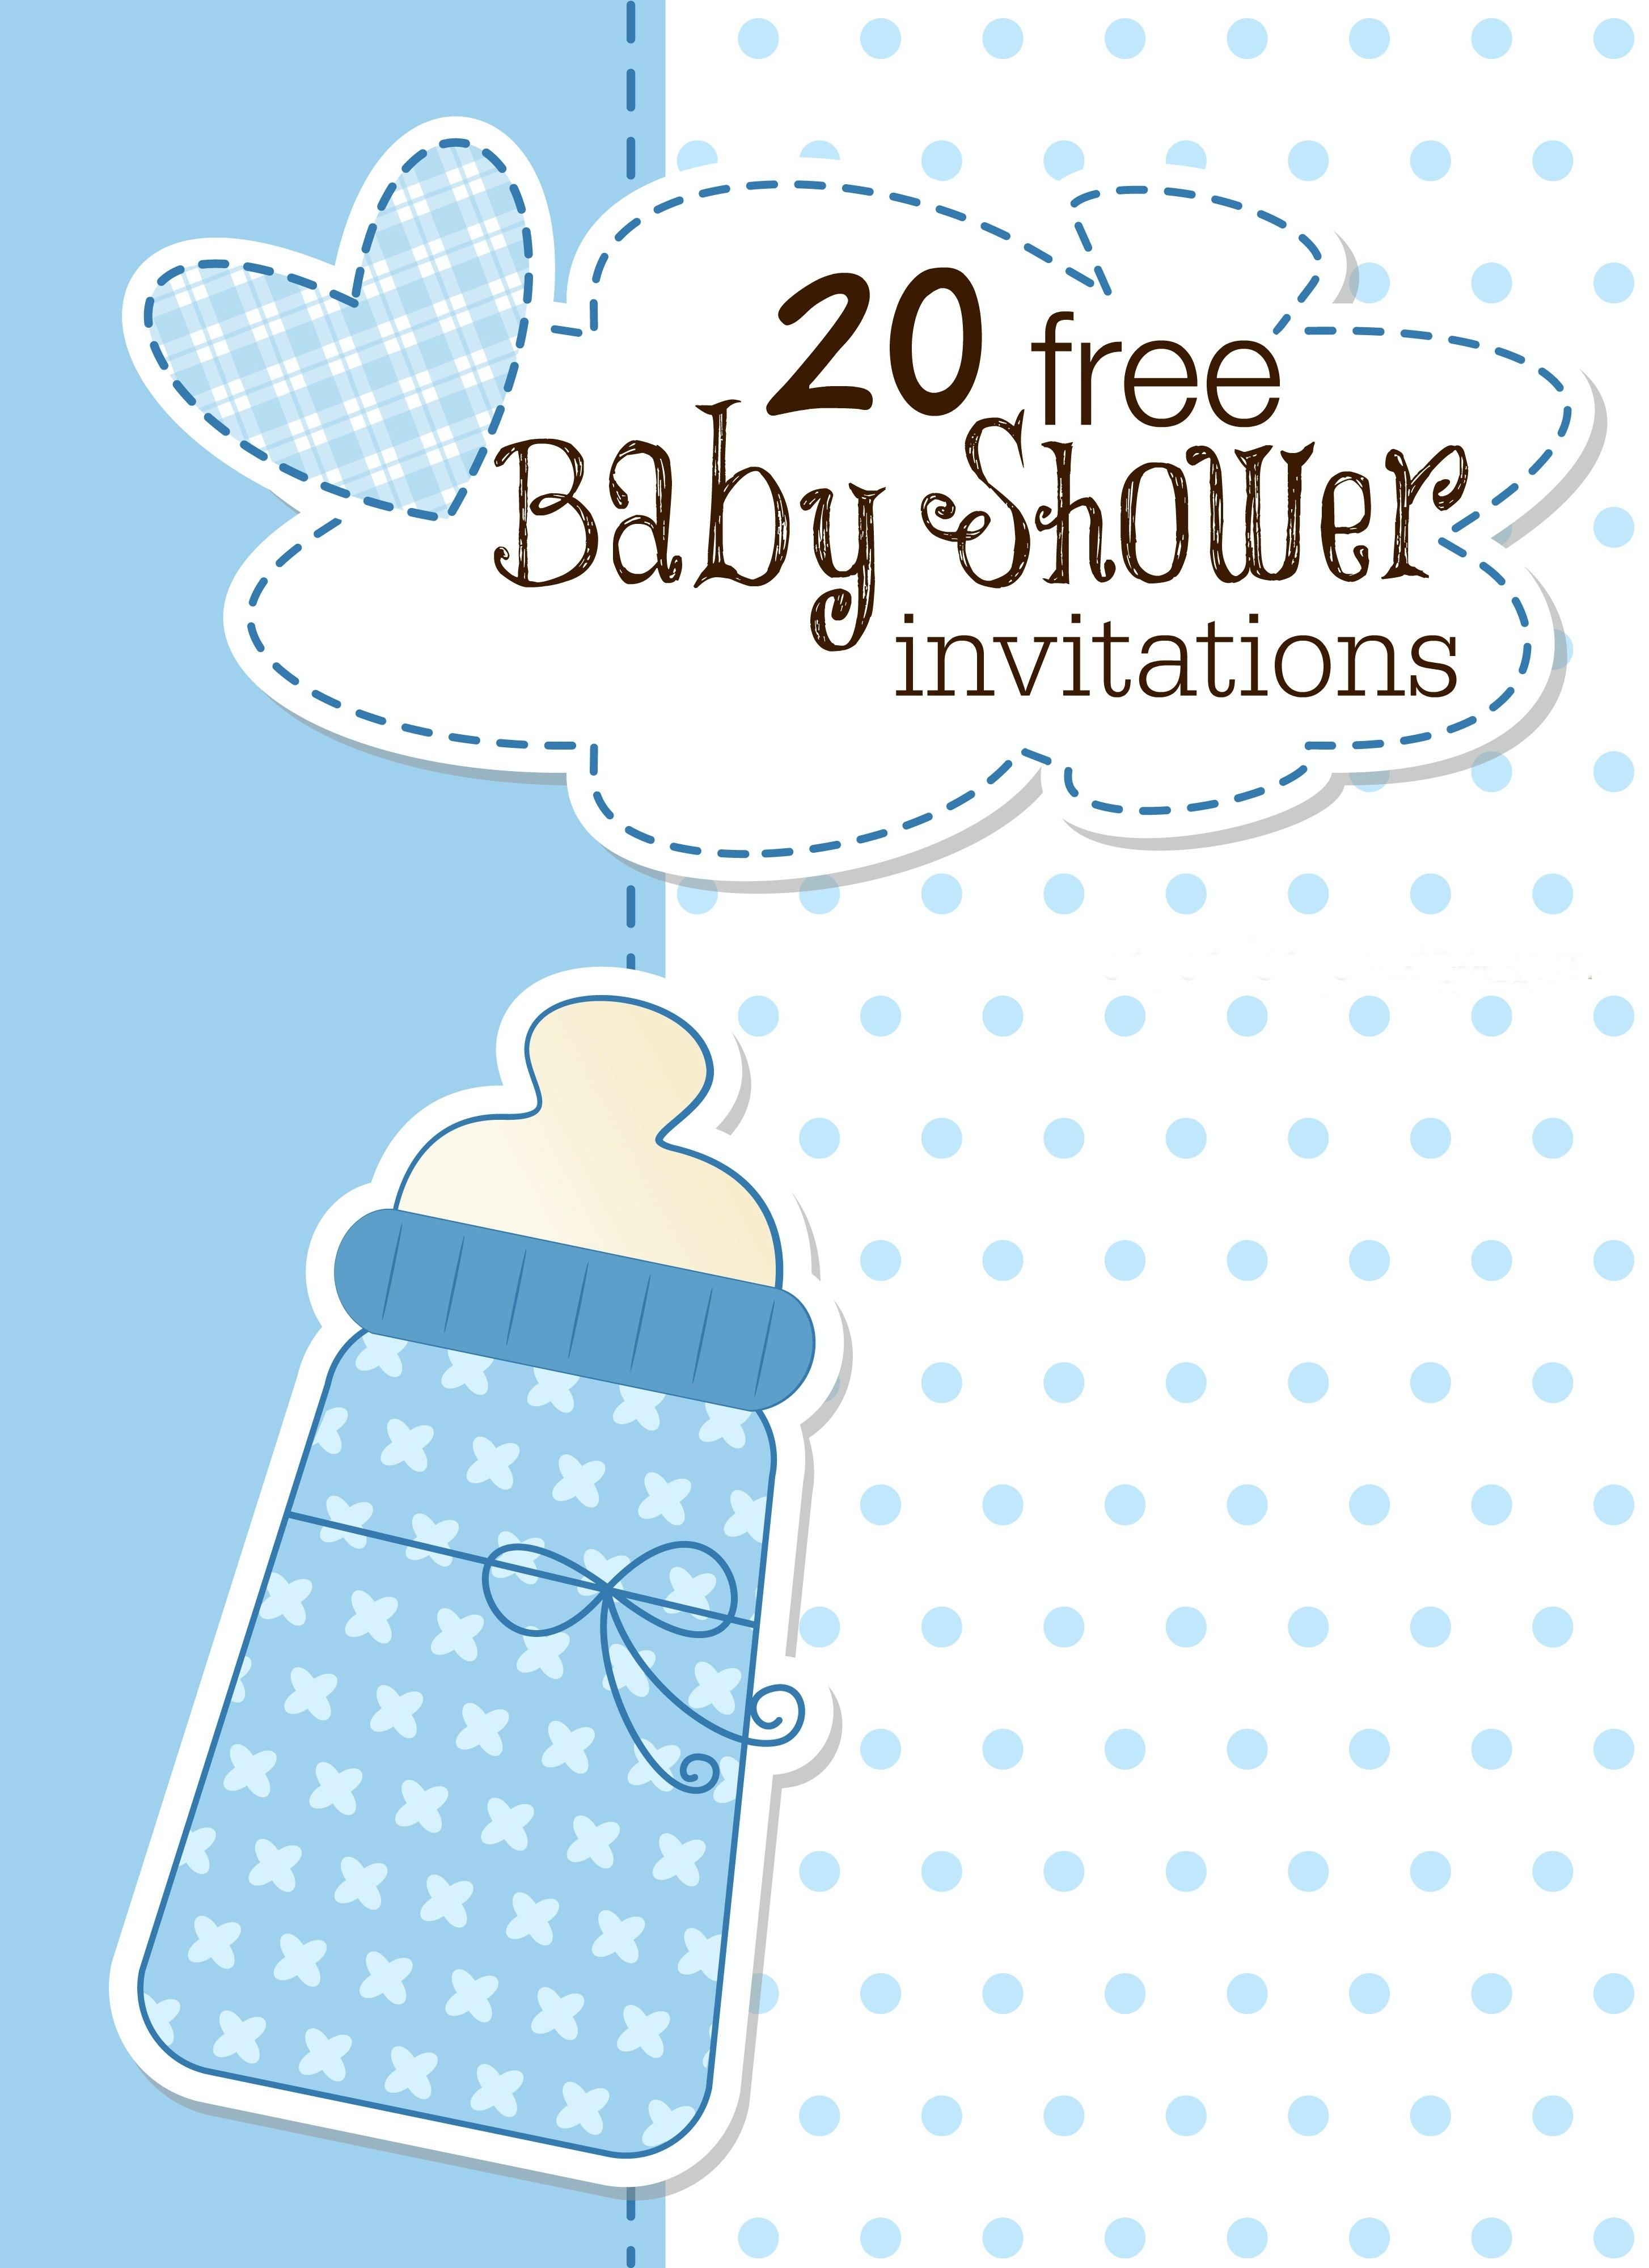 18 Printable Baby Shower Invites - Free Stork Party Invitations Printable